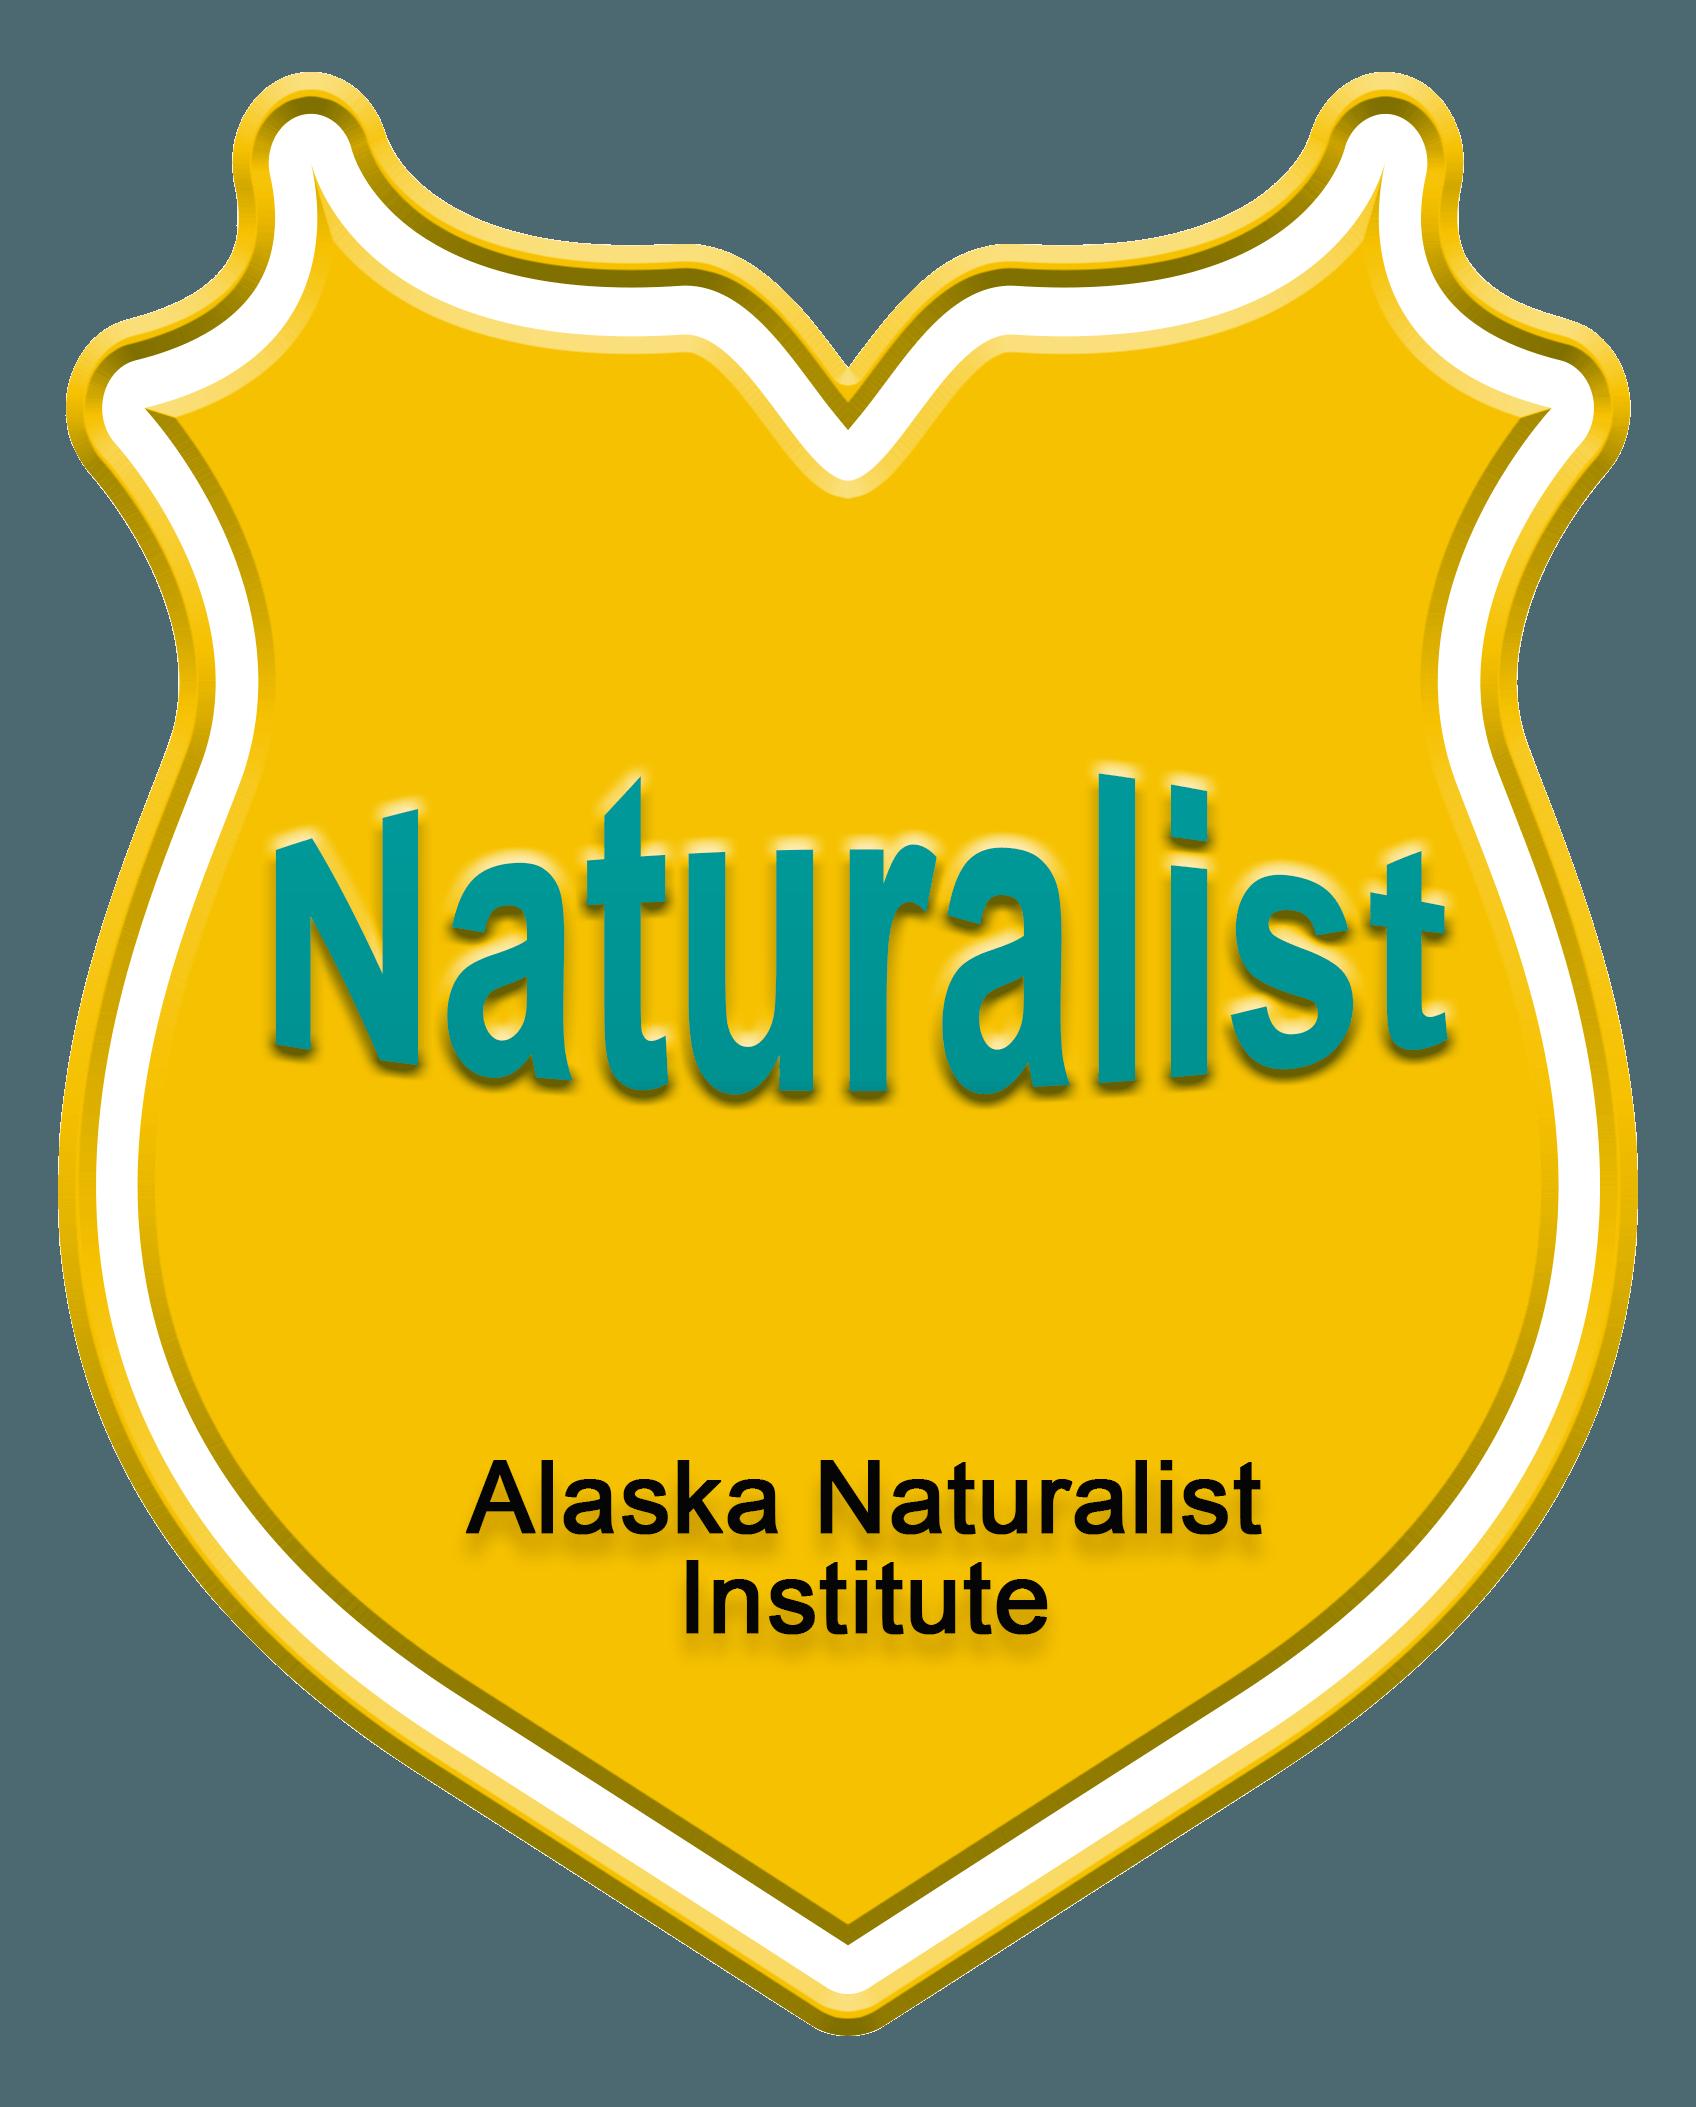 https://alaskaupclose.com/wp-content/uploads/2015/12/Naturalist.png